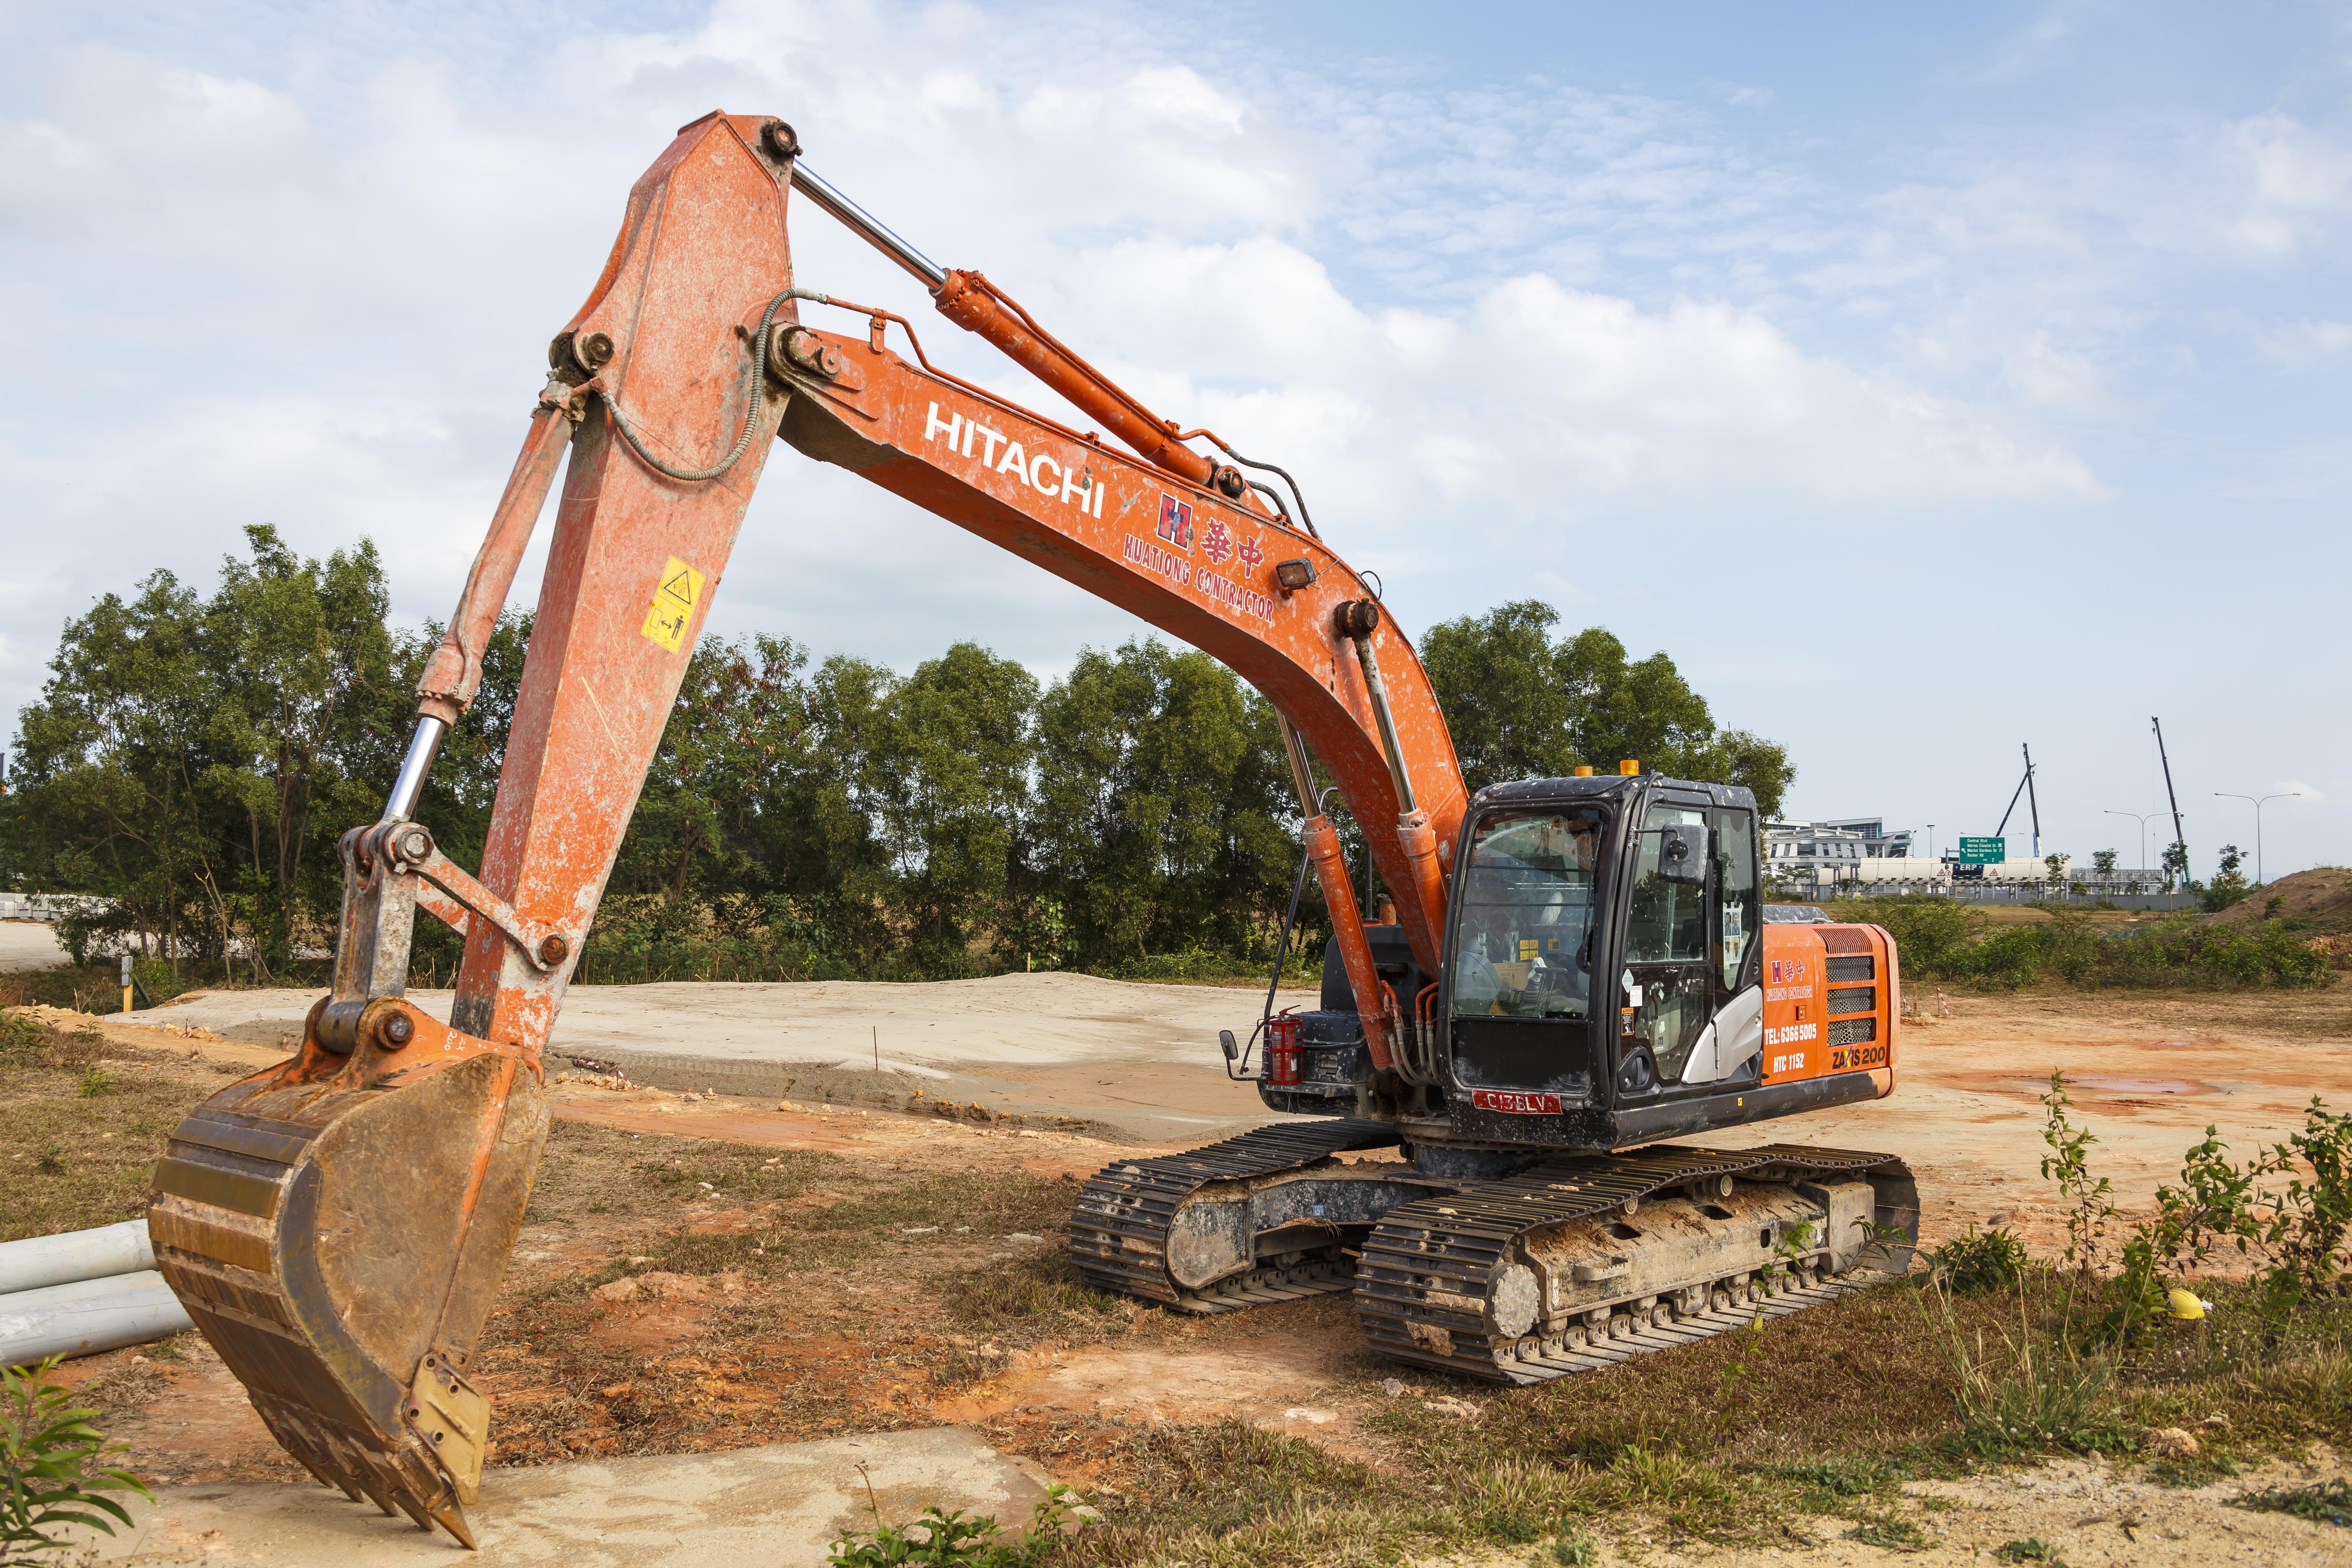 File:Singapore Hitachi-ZAXIS-200-excavator-01 jpg - Wikimedia Commons